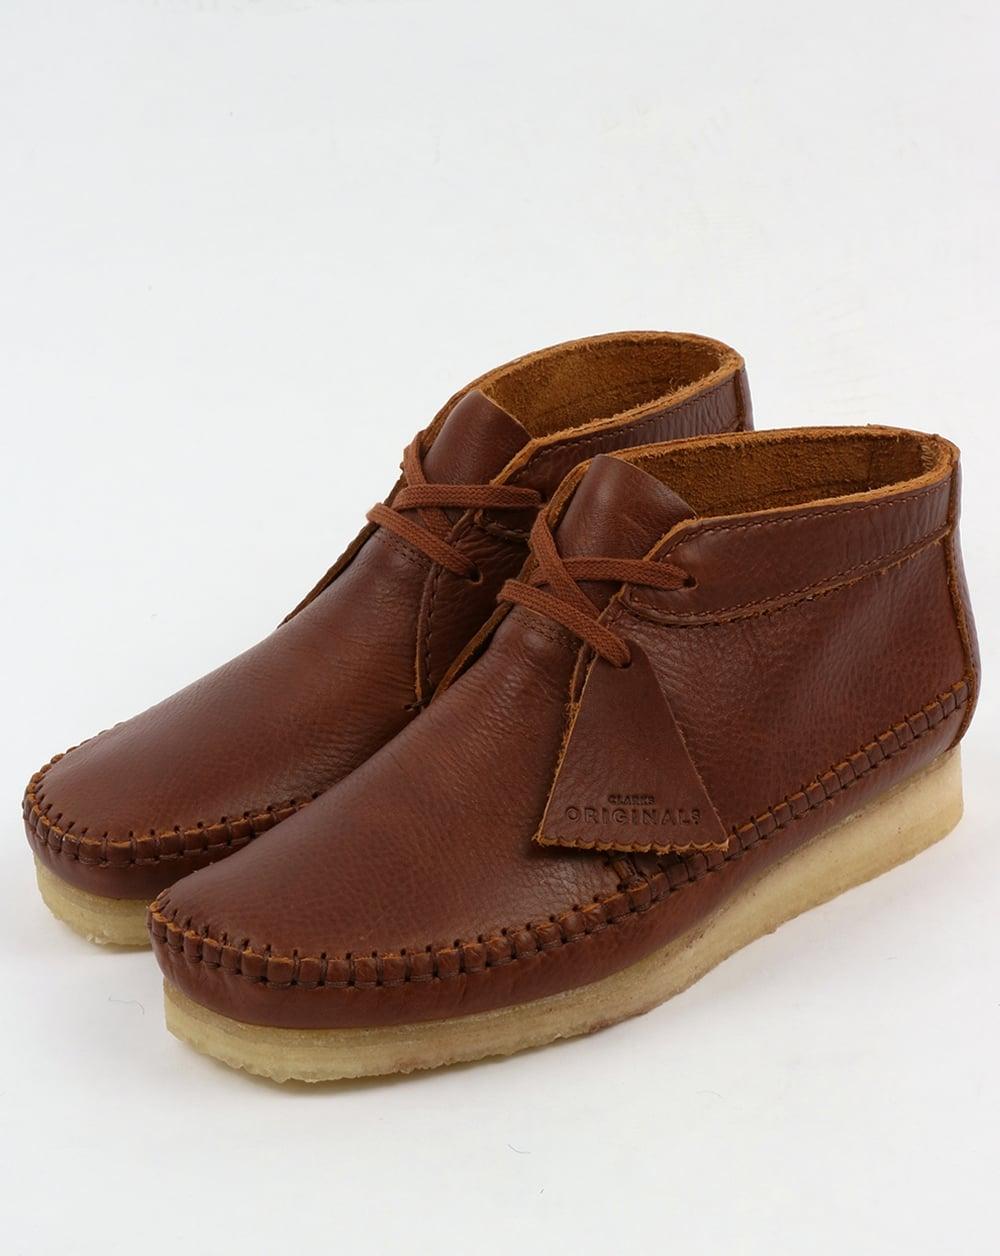 Clarks Originals Weaver Boot Tan Leather Wallabee Crepe